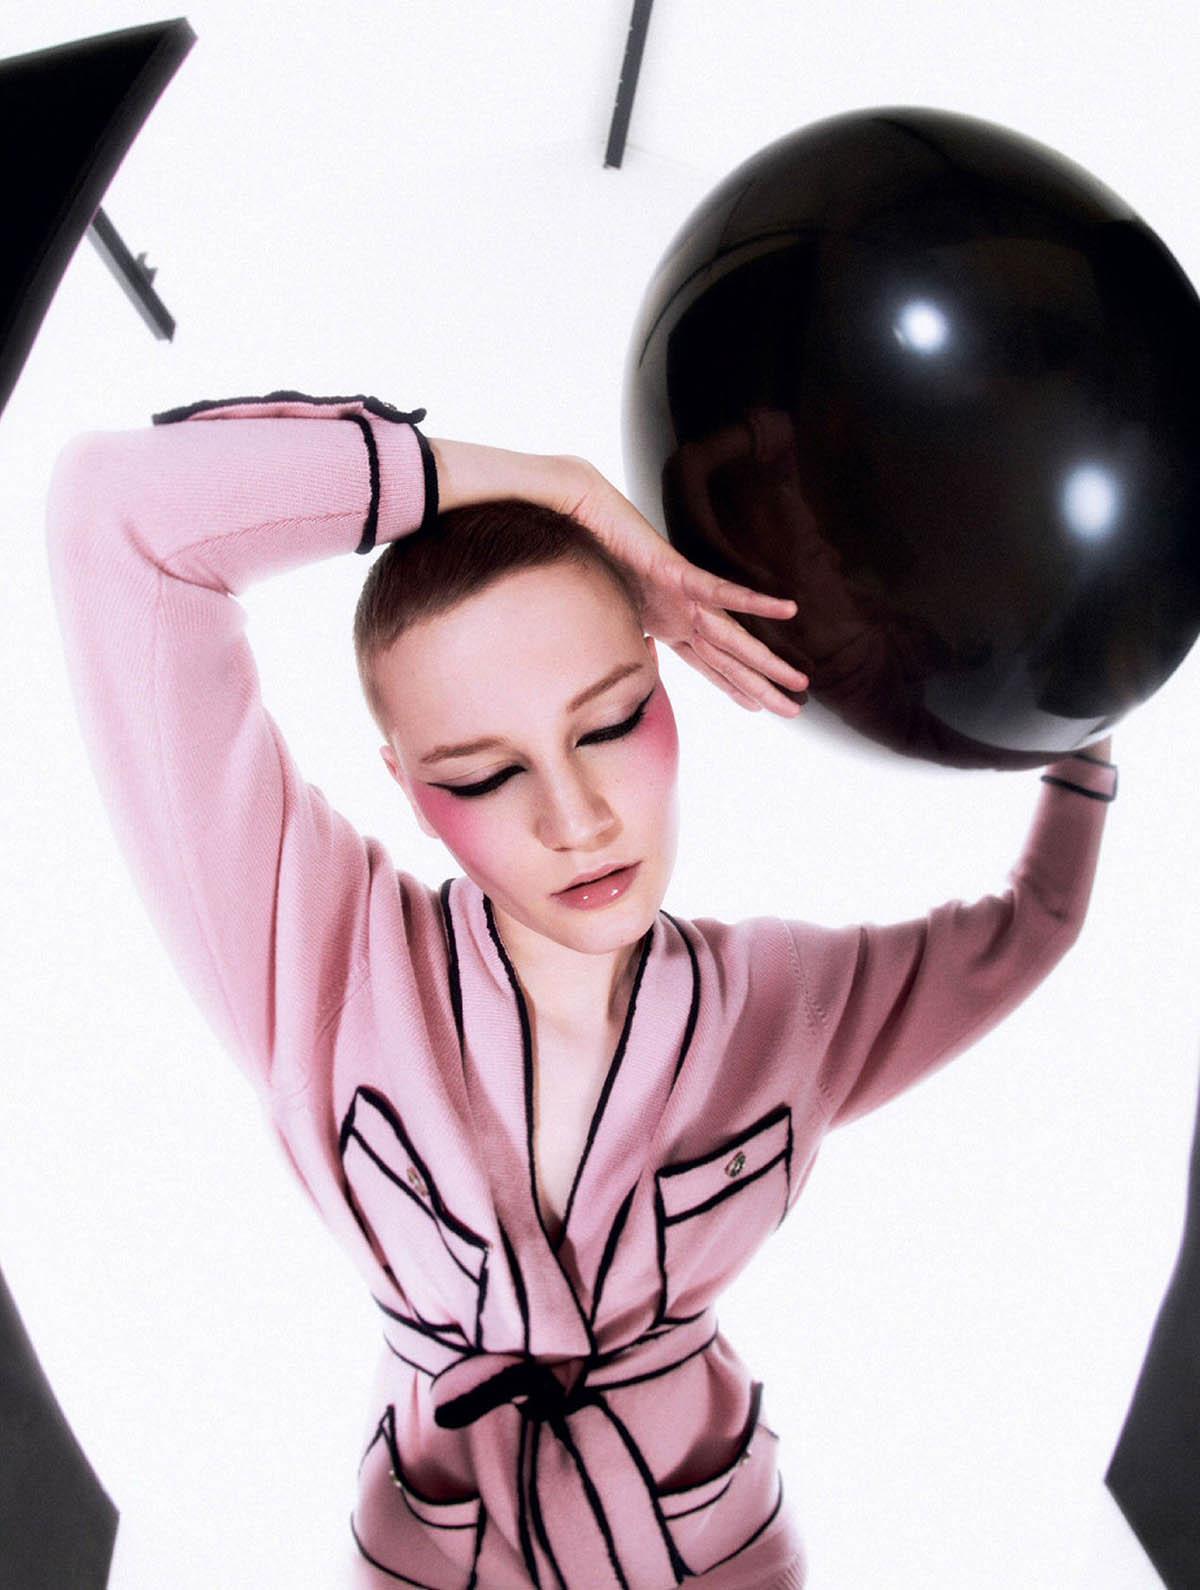 Lina Hoss by Meinke Klein for Elle UK April 2021